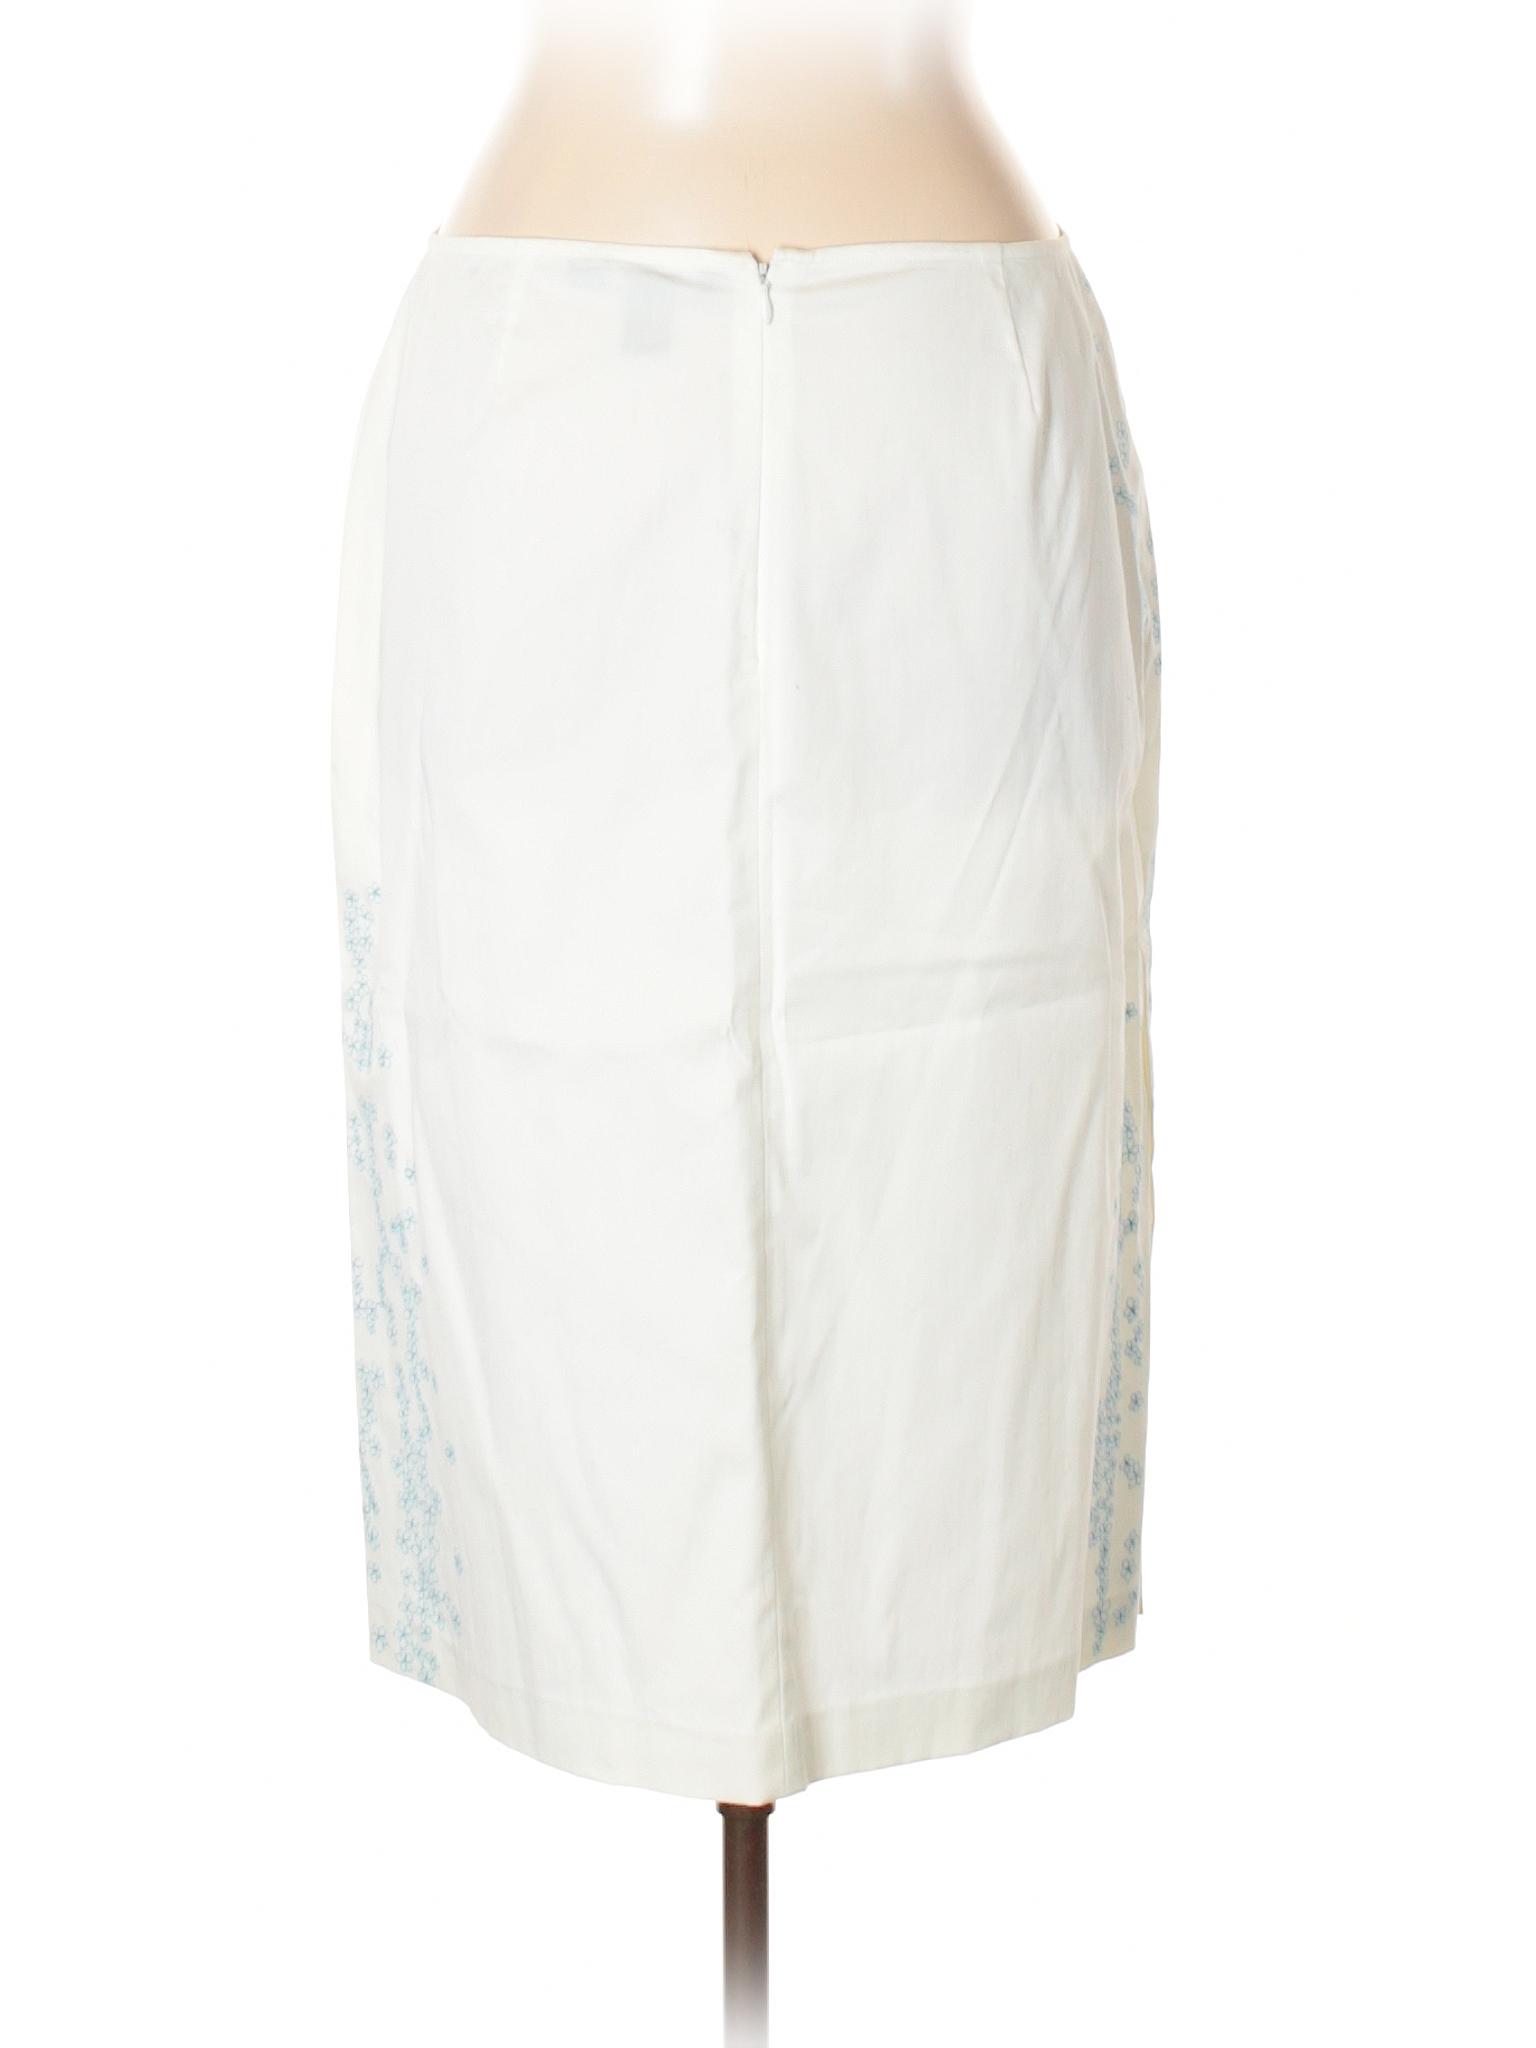 Casual Boutique Casual Skirt Boutique Boutique Skirt Skirt Casual Casual Boutique Ctxqw0nO